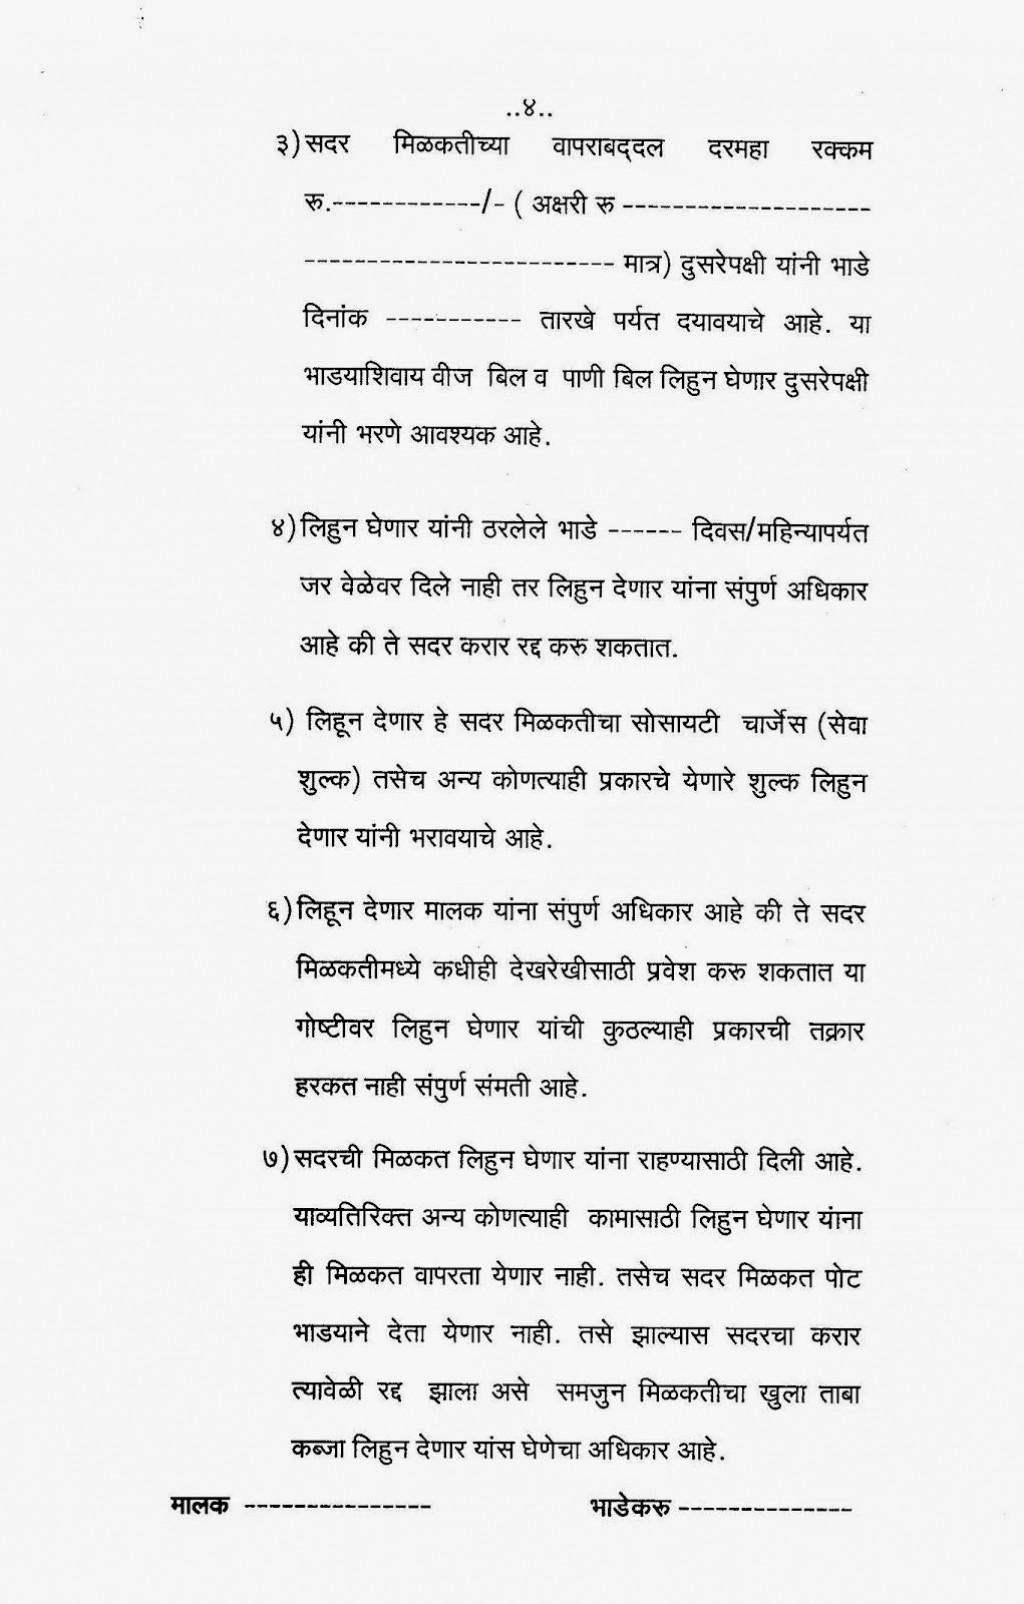 007 Wondrou Room Rent Agreement Format In Hindi Pdf Photo Large